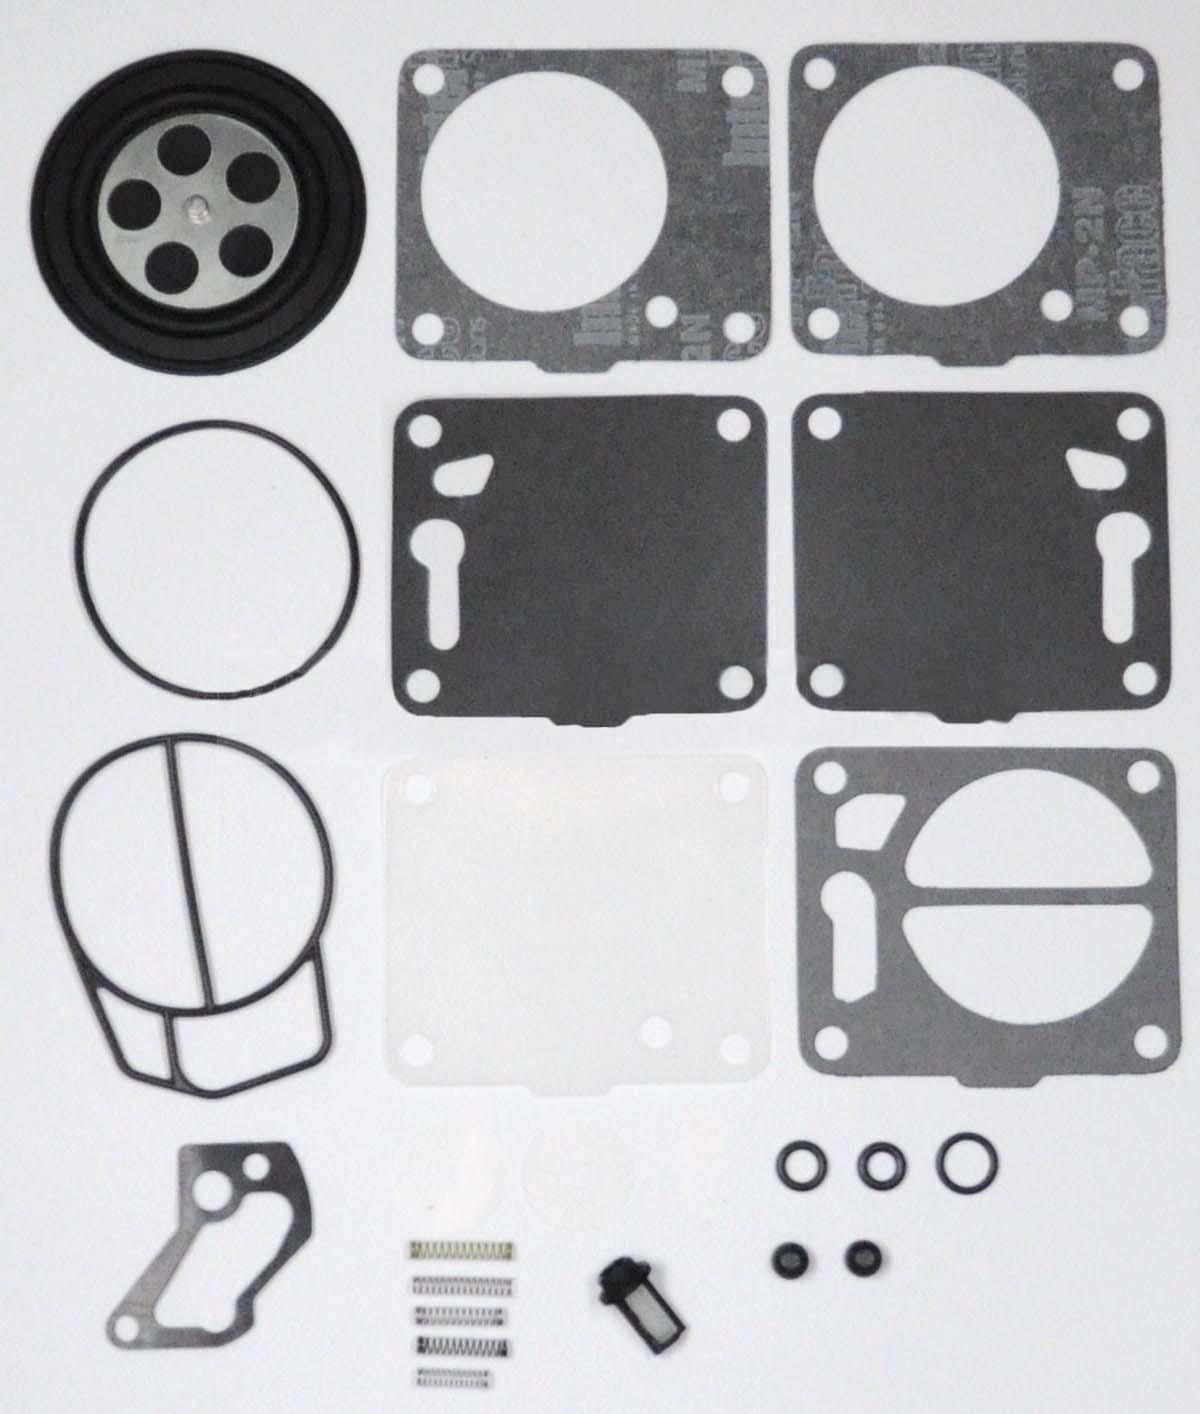 Mikuni Sbn 38 adjustment Manual